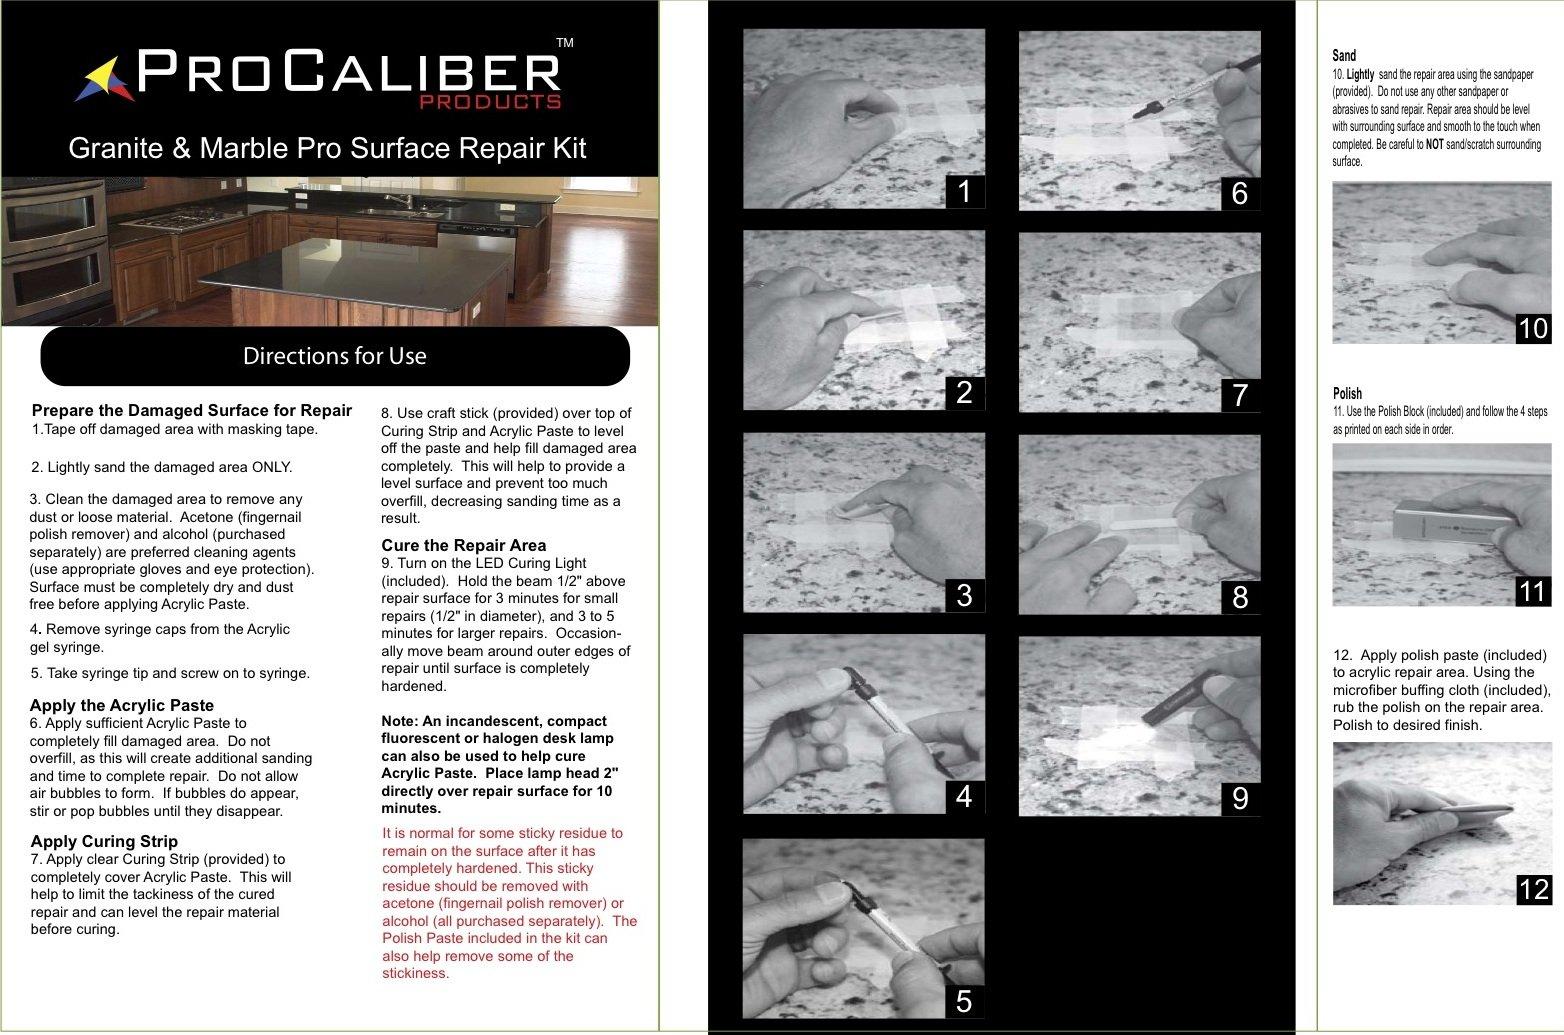 ProCaliber Products 20-13-1012 LCA Black Black Granite/Quartz and Marble PRO Chip Repair Kit, 0.07 oz.